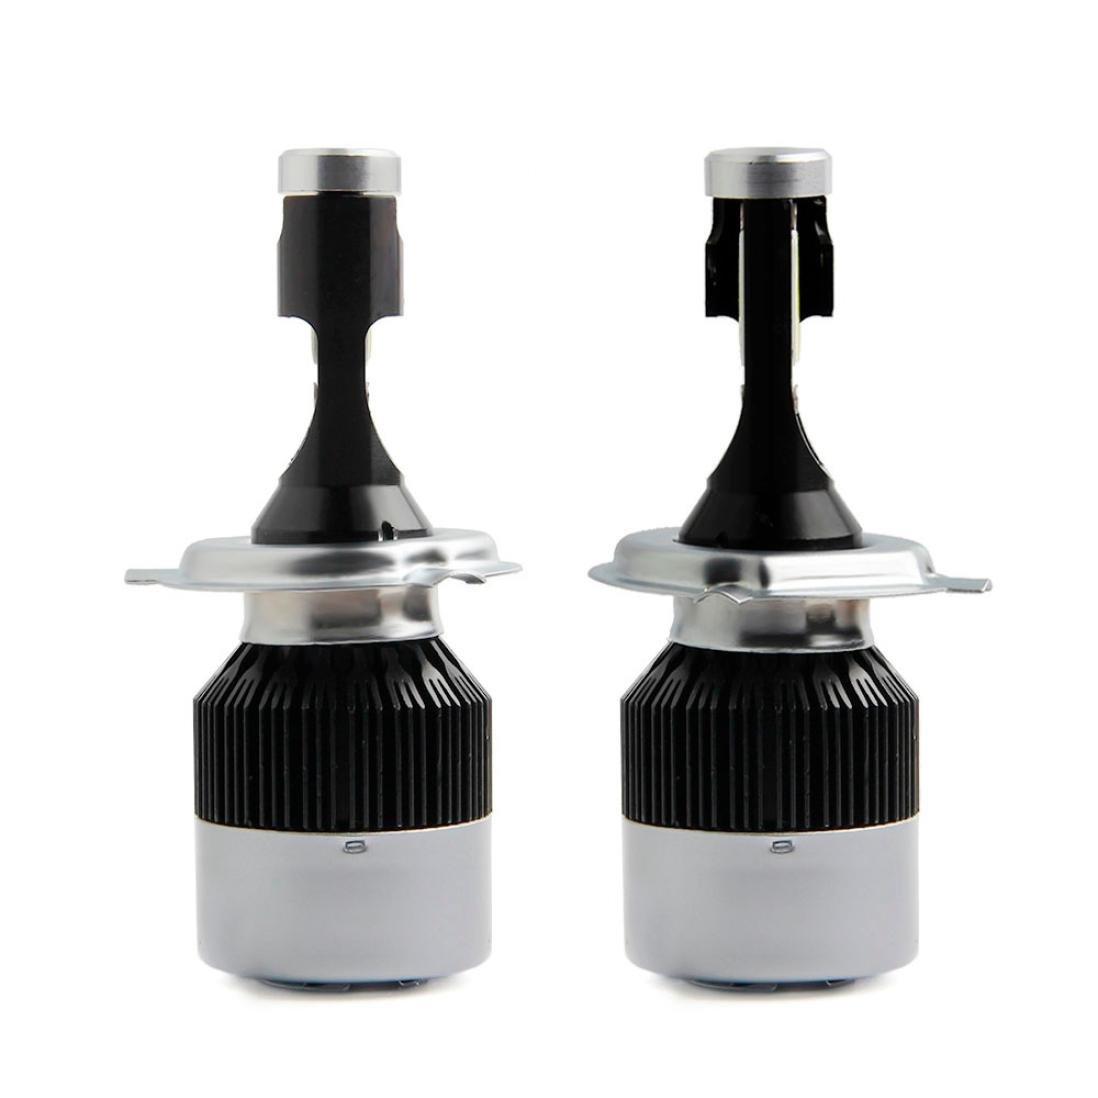 ELOGOOG Car LED Headlight Conversion Kit 72W 8000LM Car Beam Bulb Driving Lamp 6500K (H4)